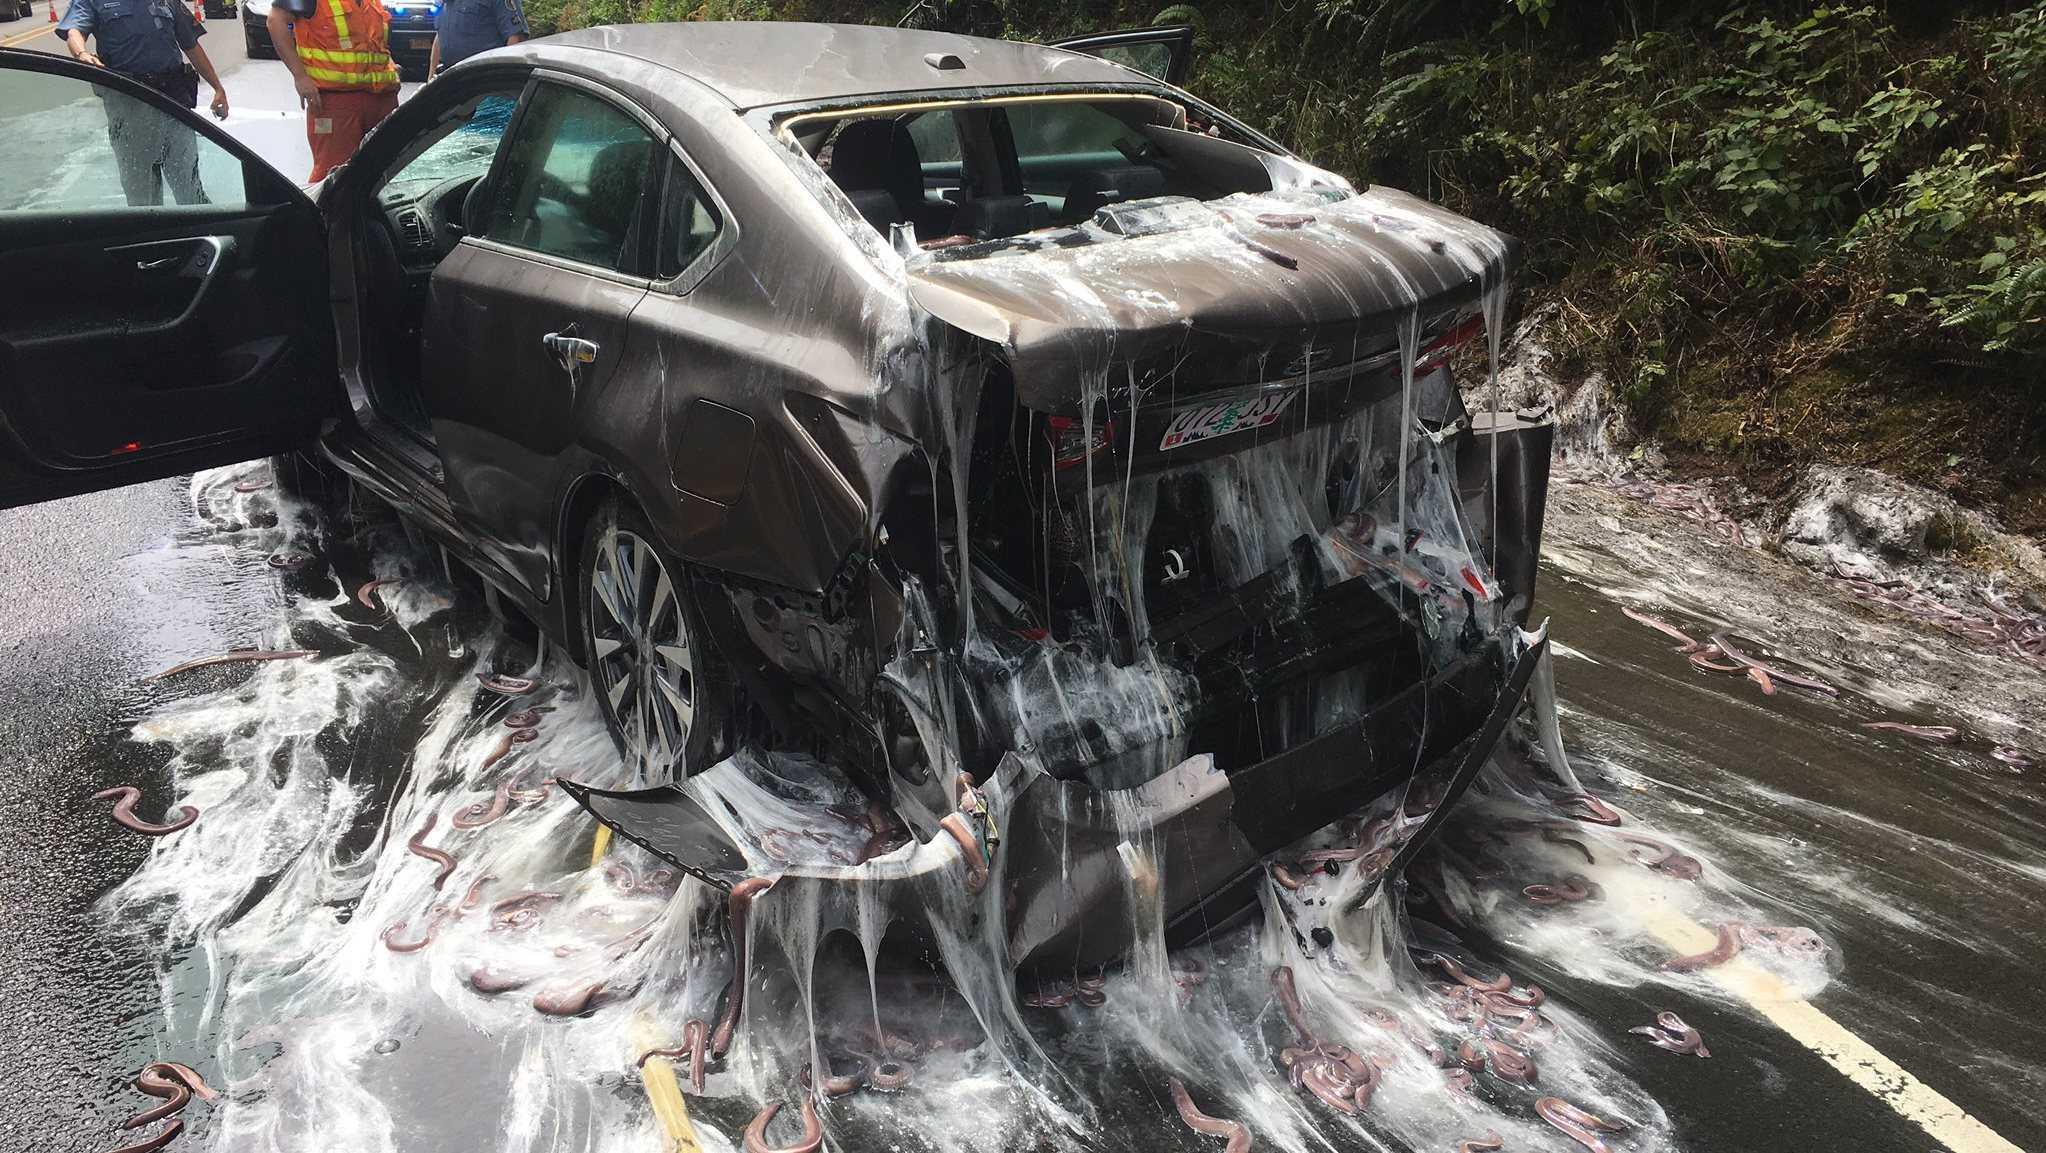 Drivers Get Slimed by Eels in Oregon